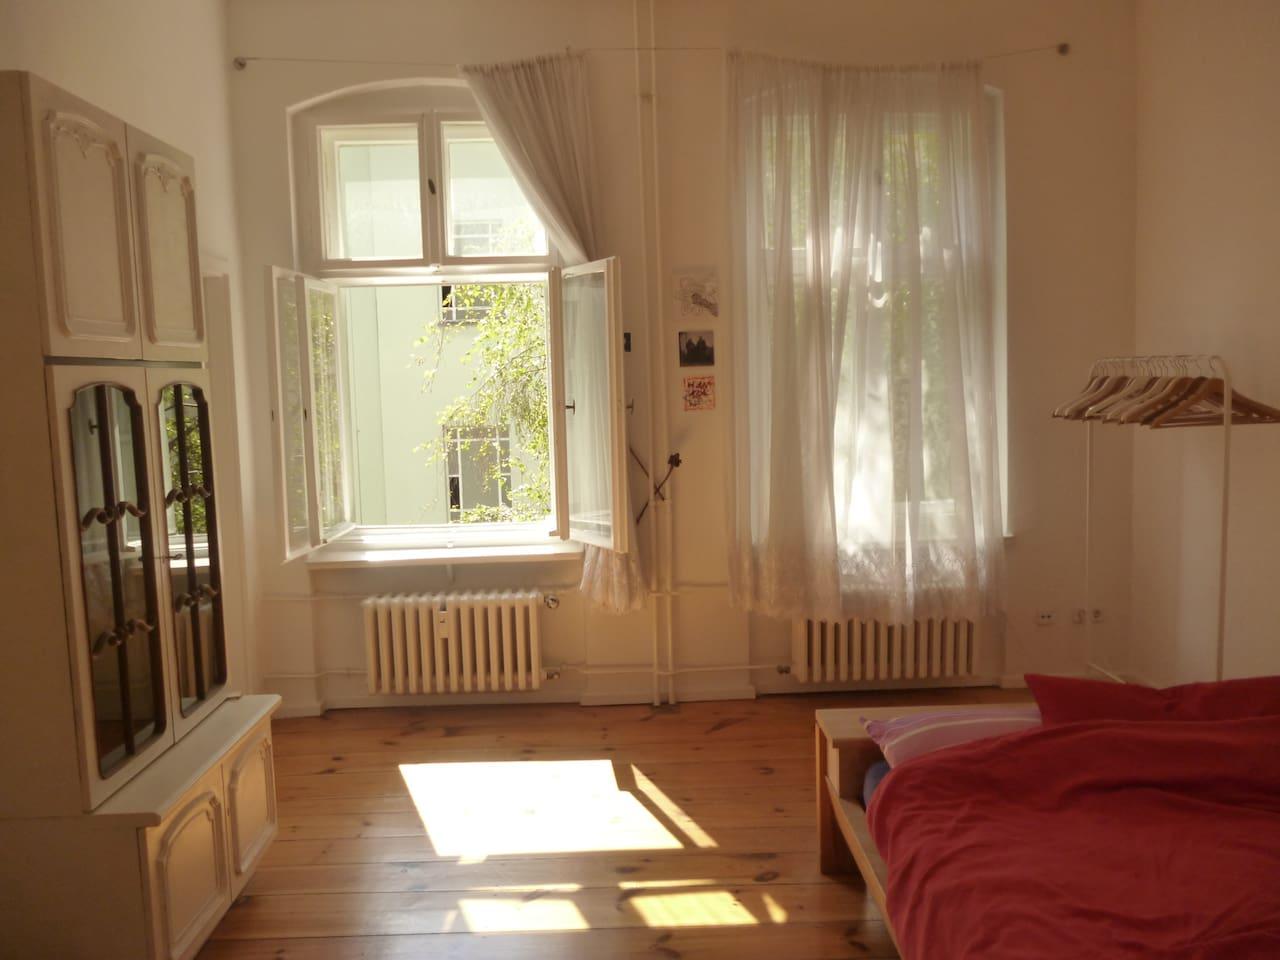 cosy flat in Neukölln , central, quiet and full of light